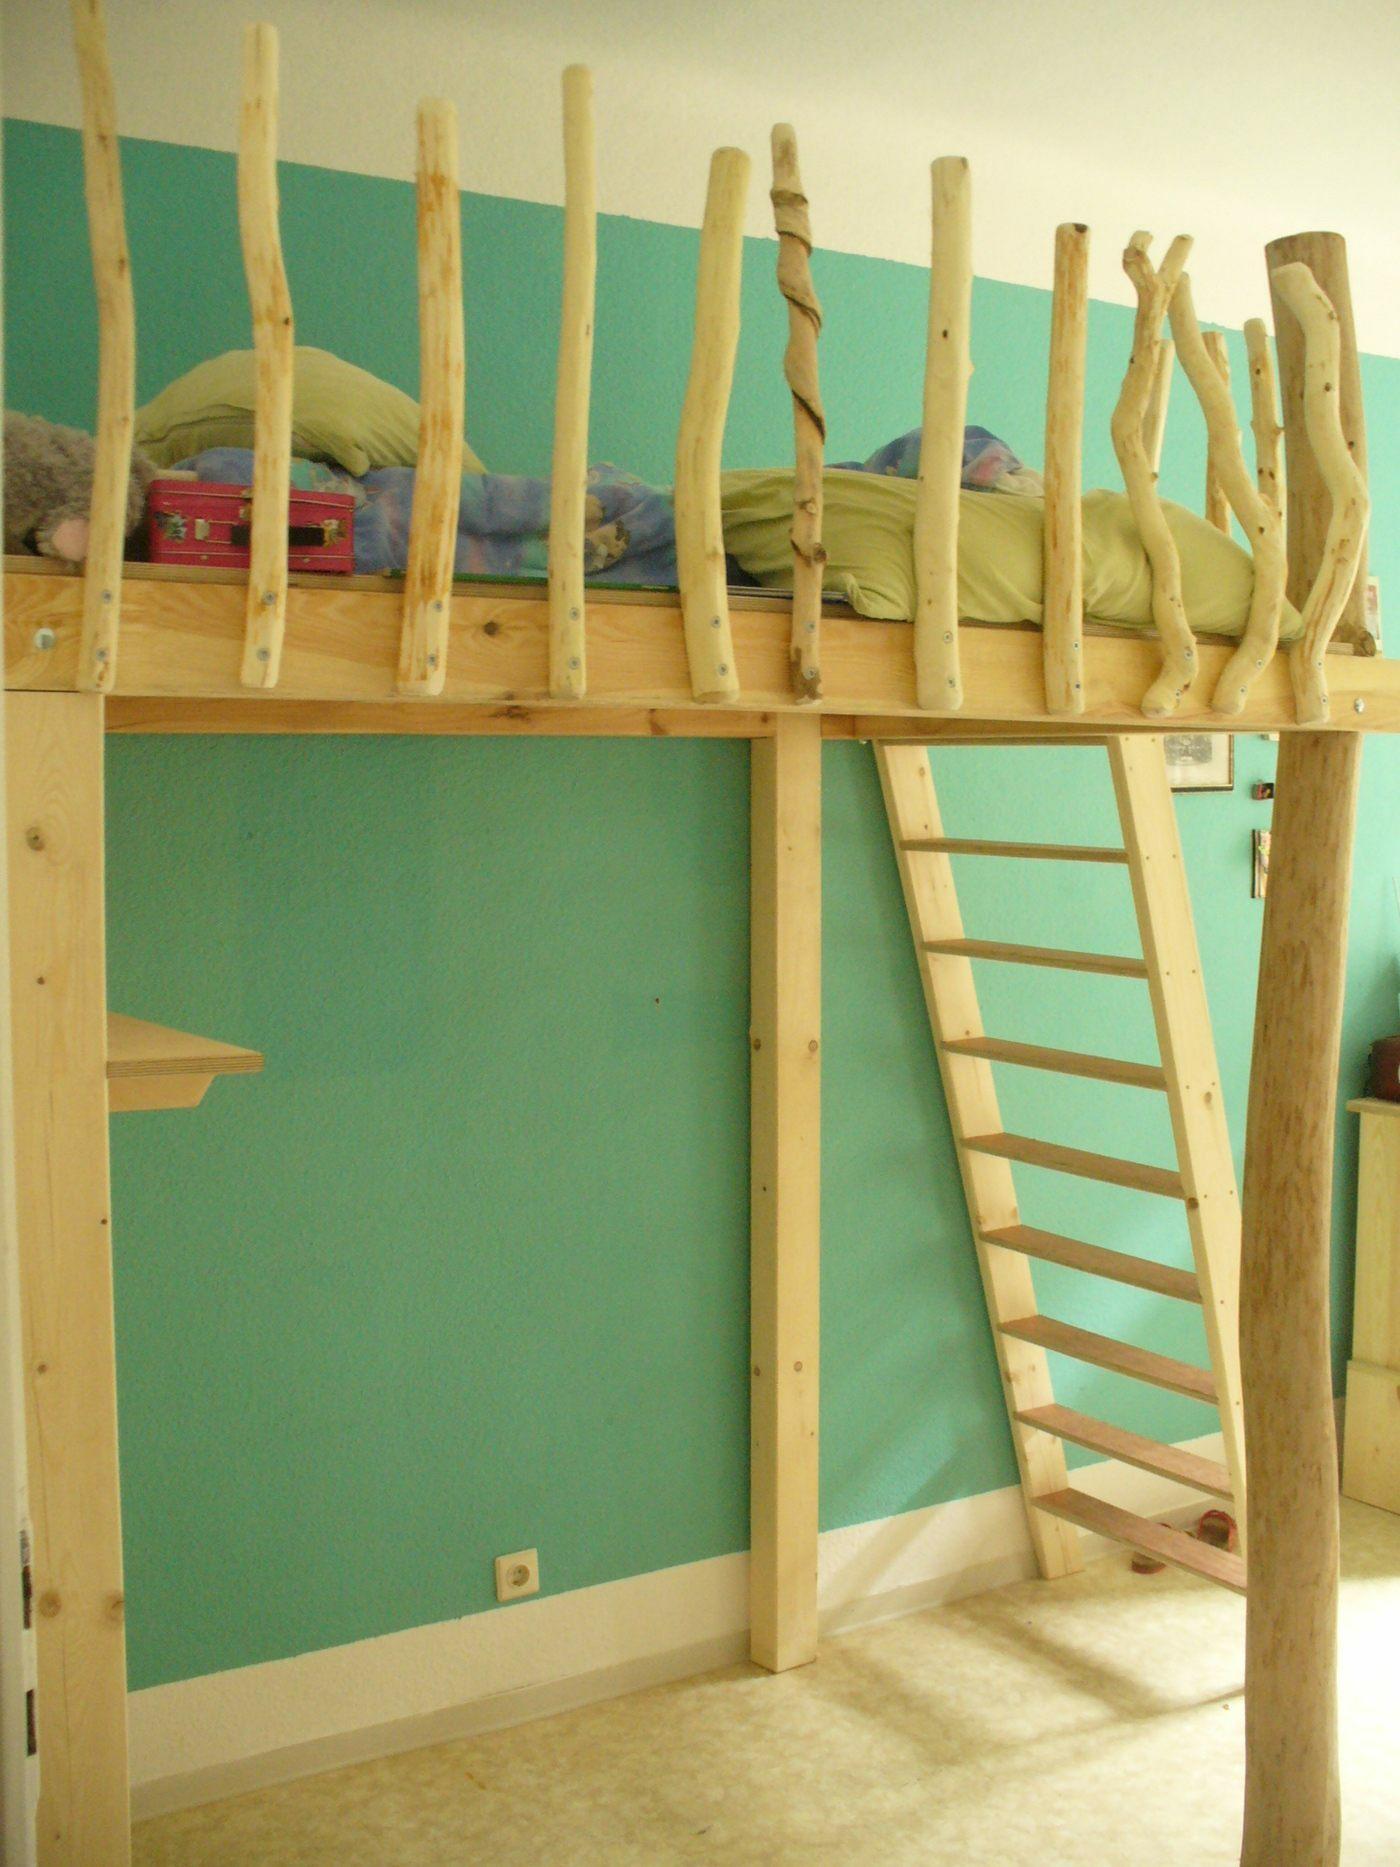 hochbett aus wildholz eigenbaukombinat. Black Bedroom Furniture Sets. Home Design Ideas